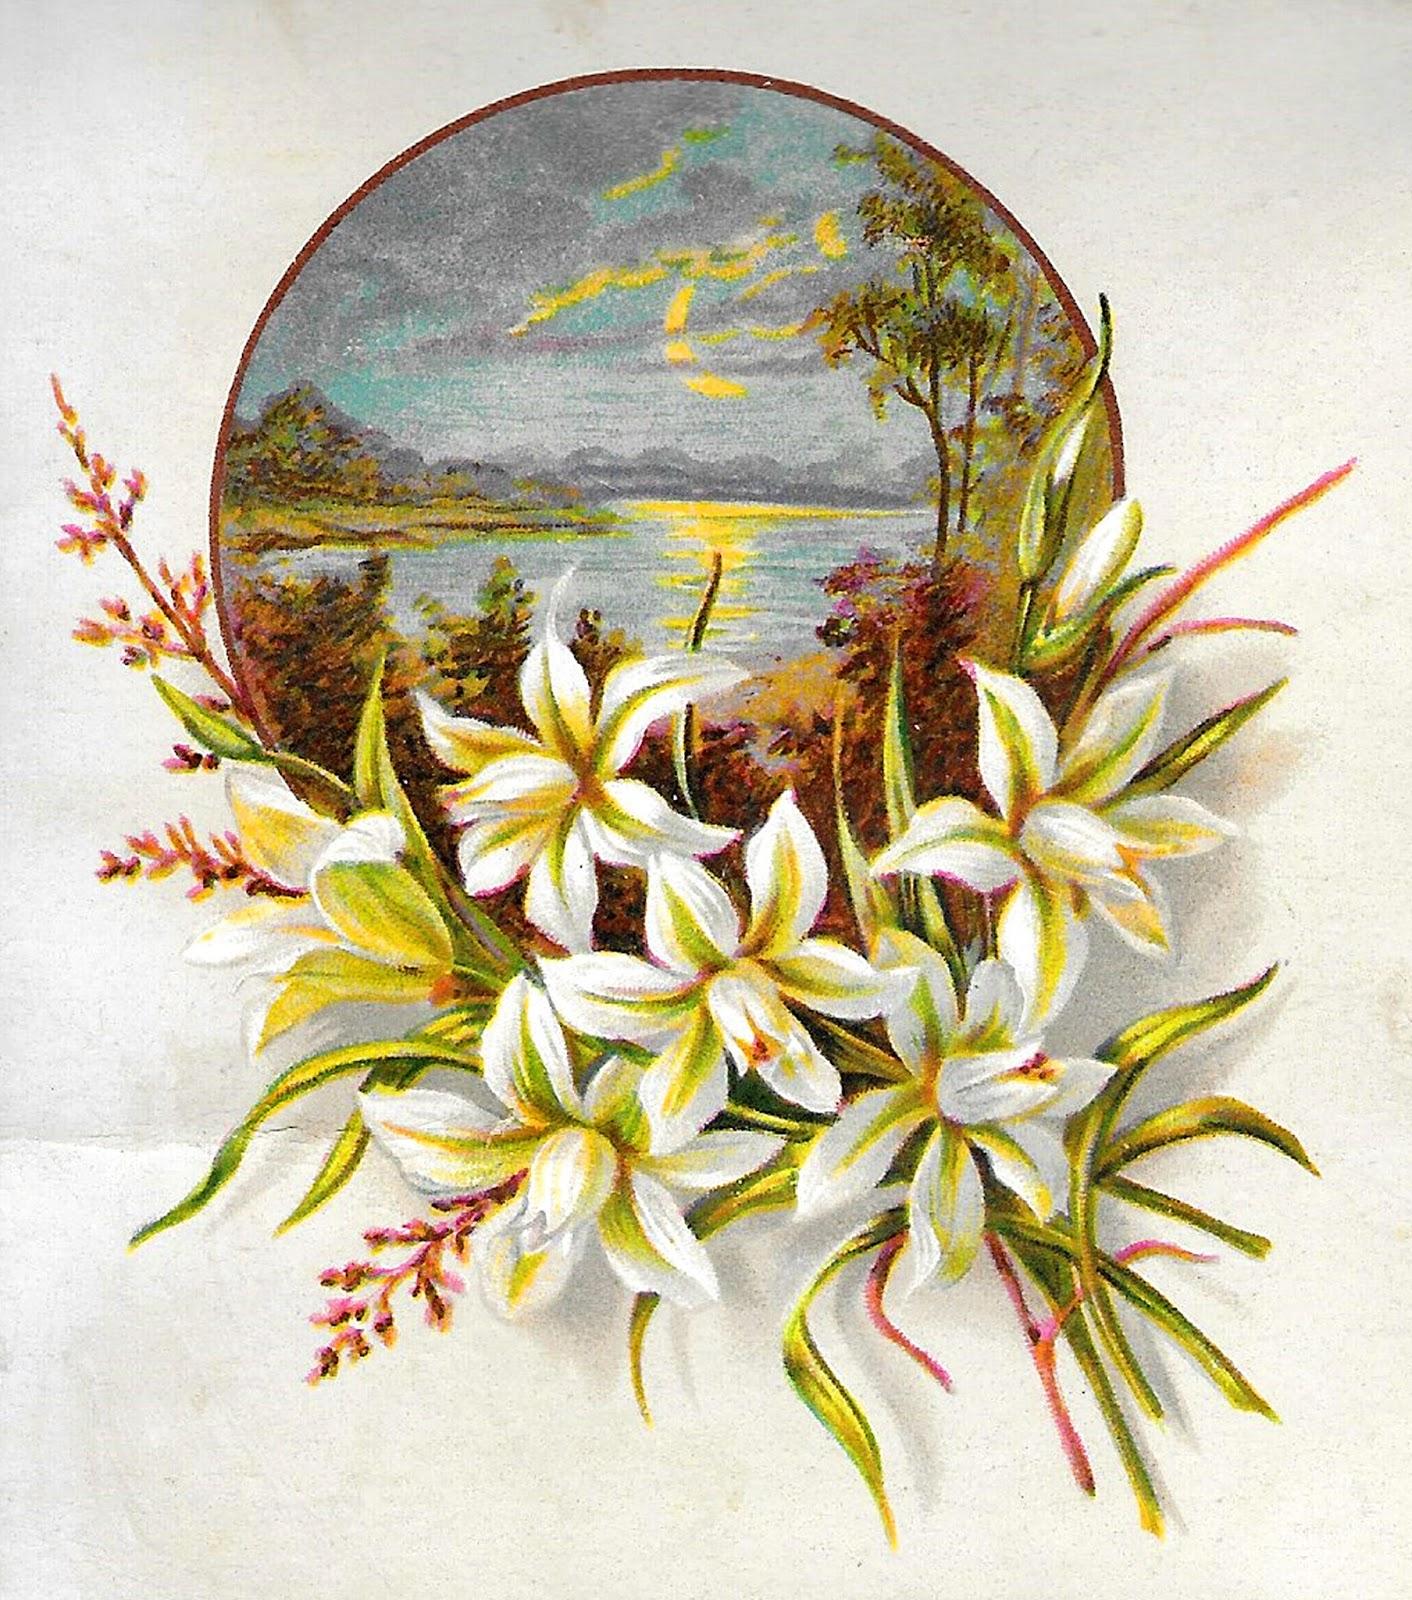 Antique Lily Flower Floral Greeting Design 1 412 1 600